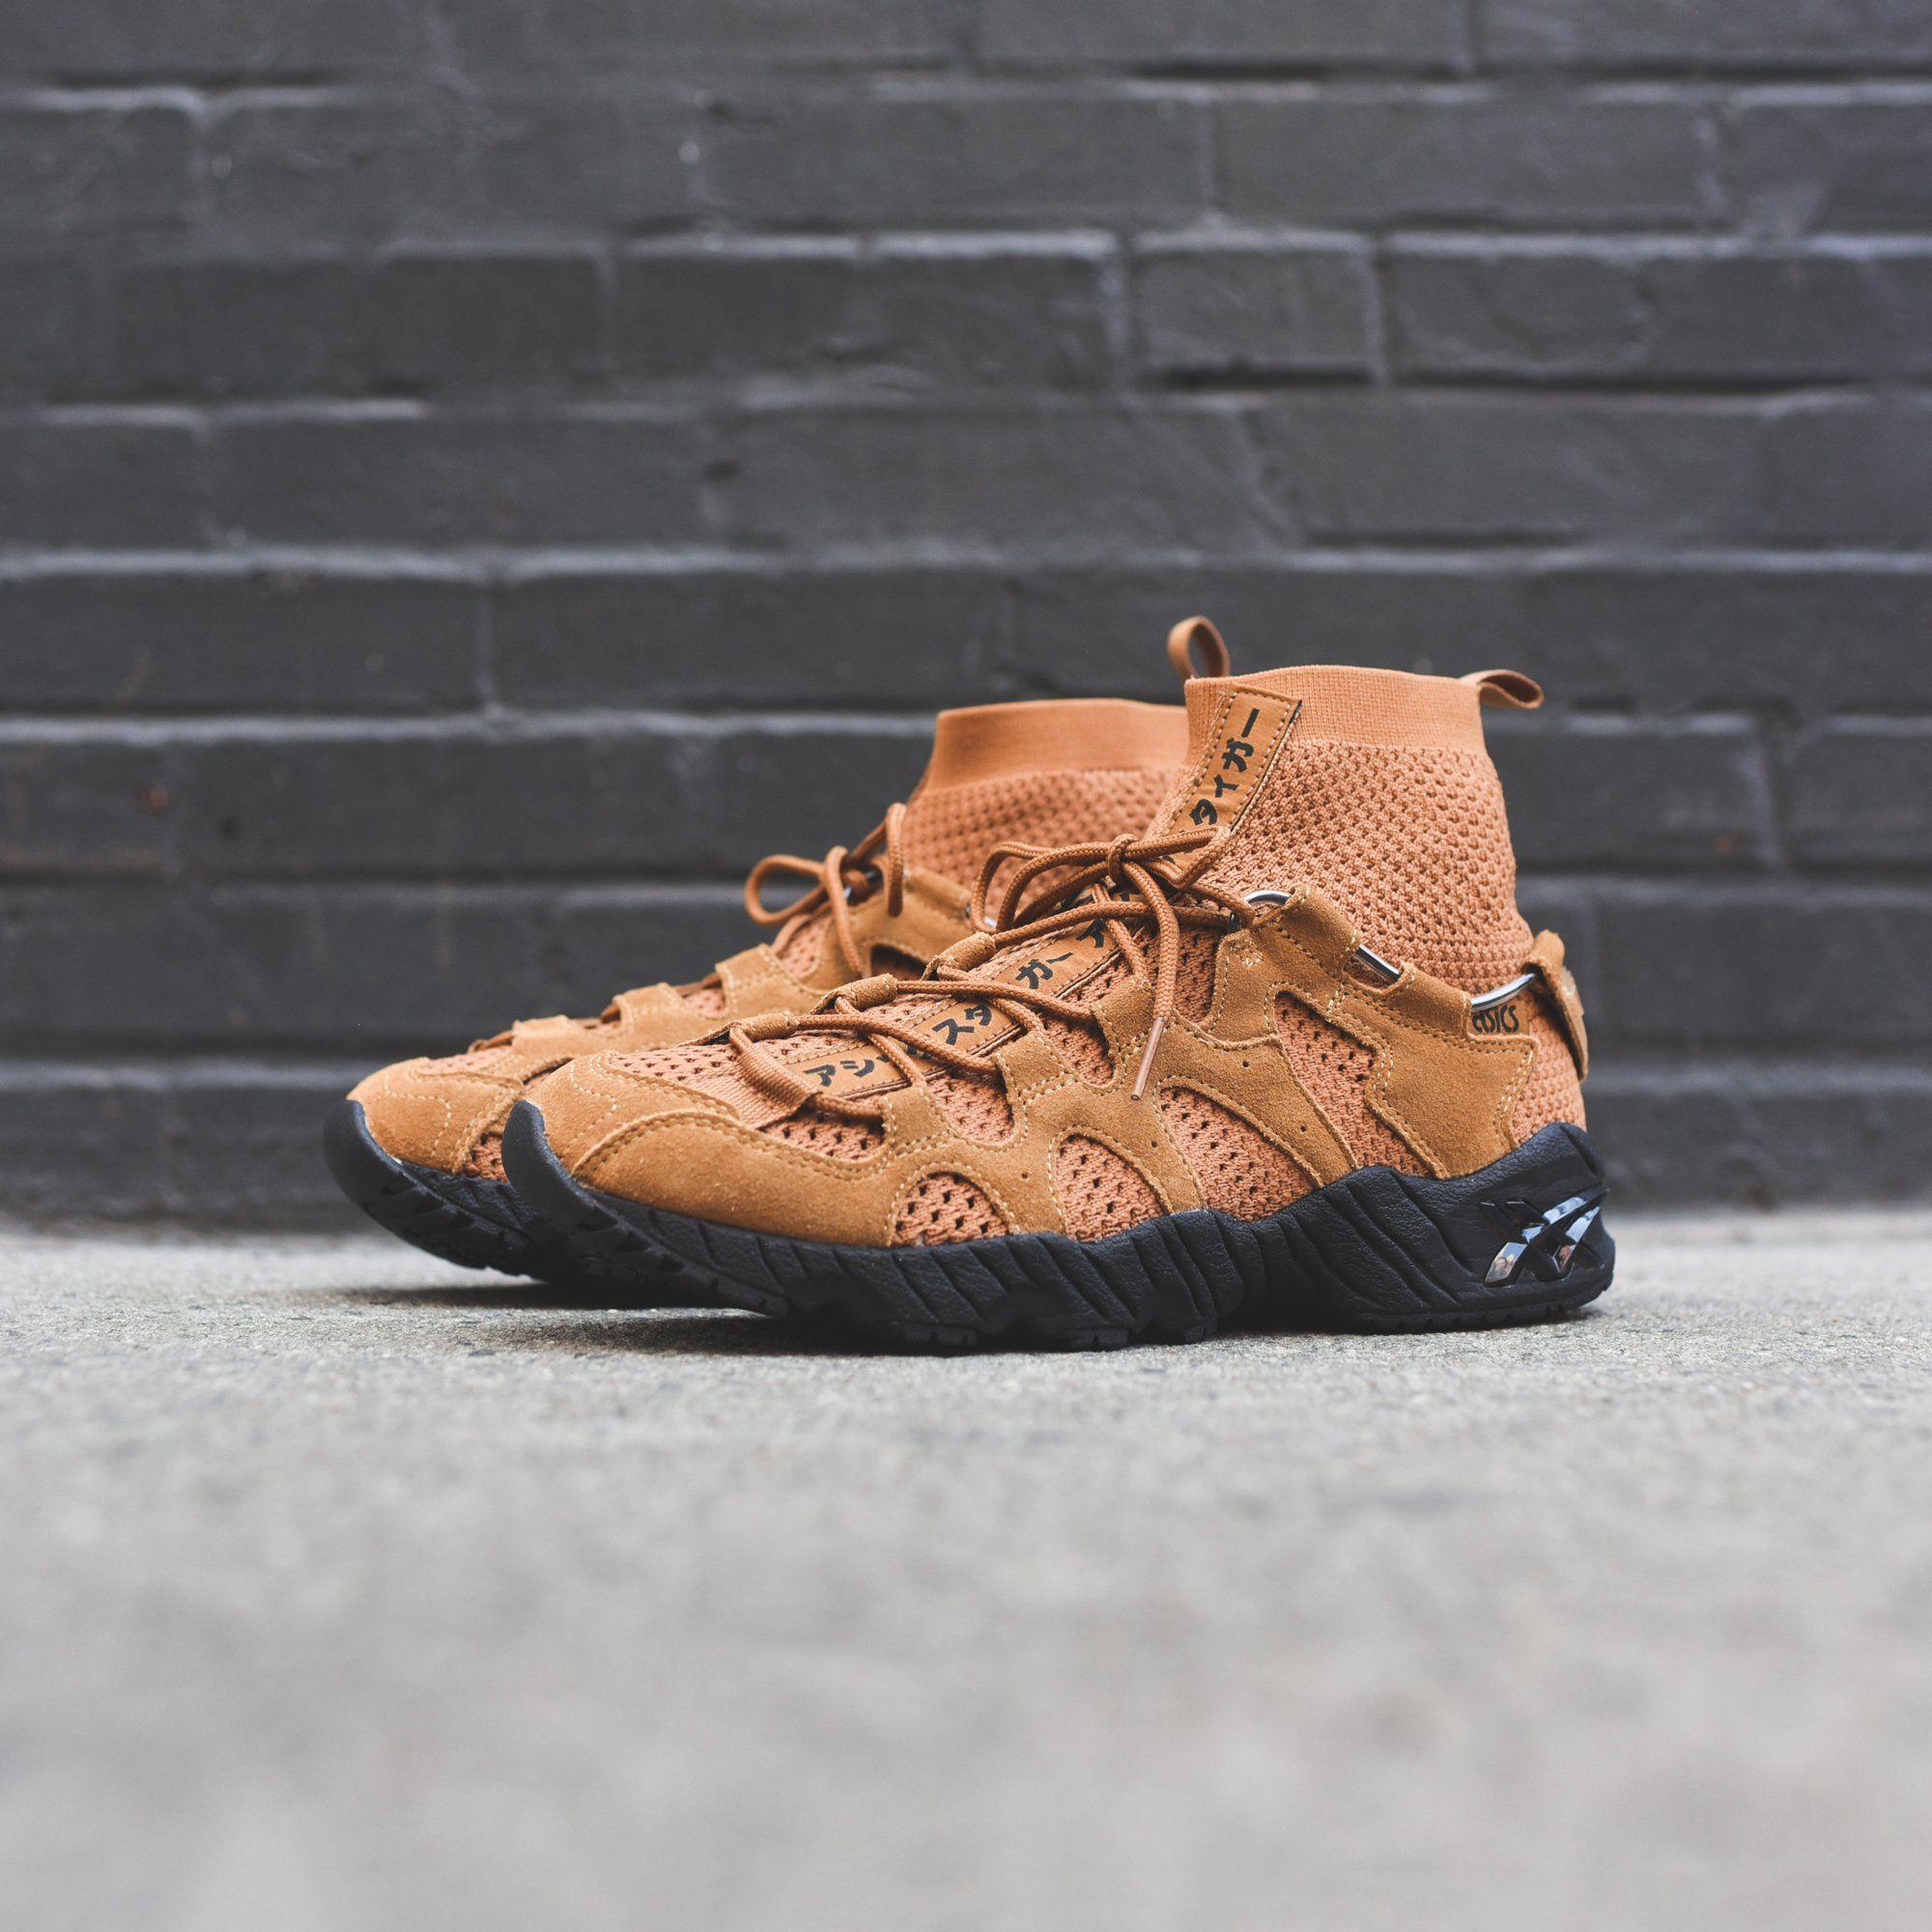 newest ea799 9292d Asics Gel-Mai Knit MT - Wheat / Black - 8   Fresh Sneakers ...